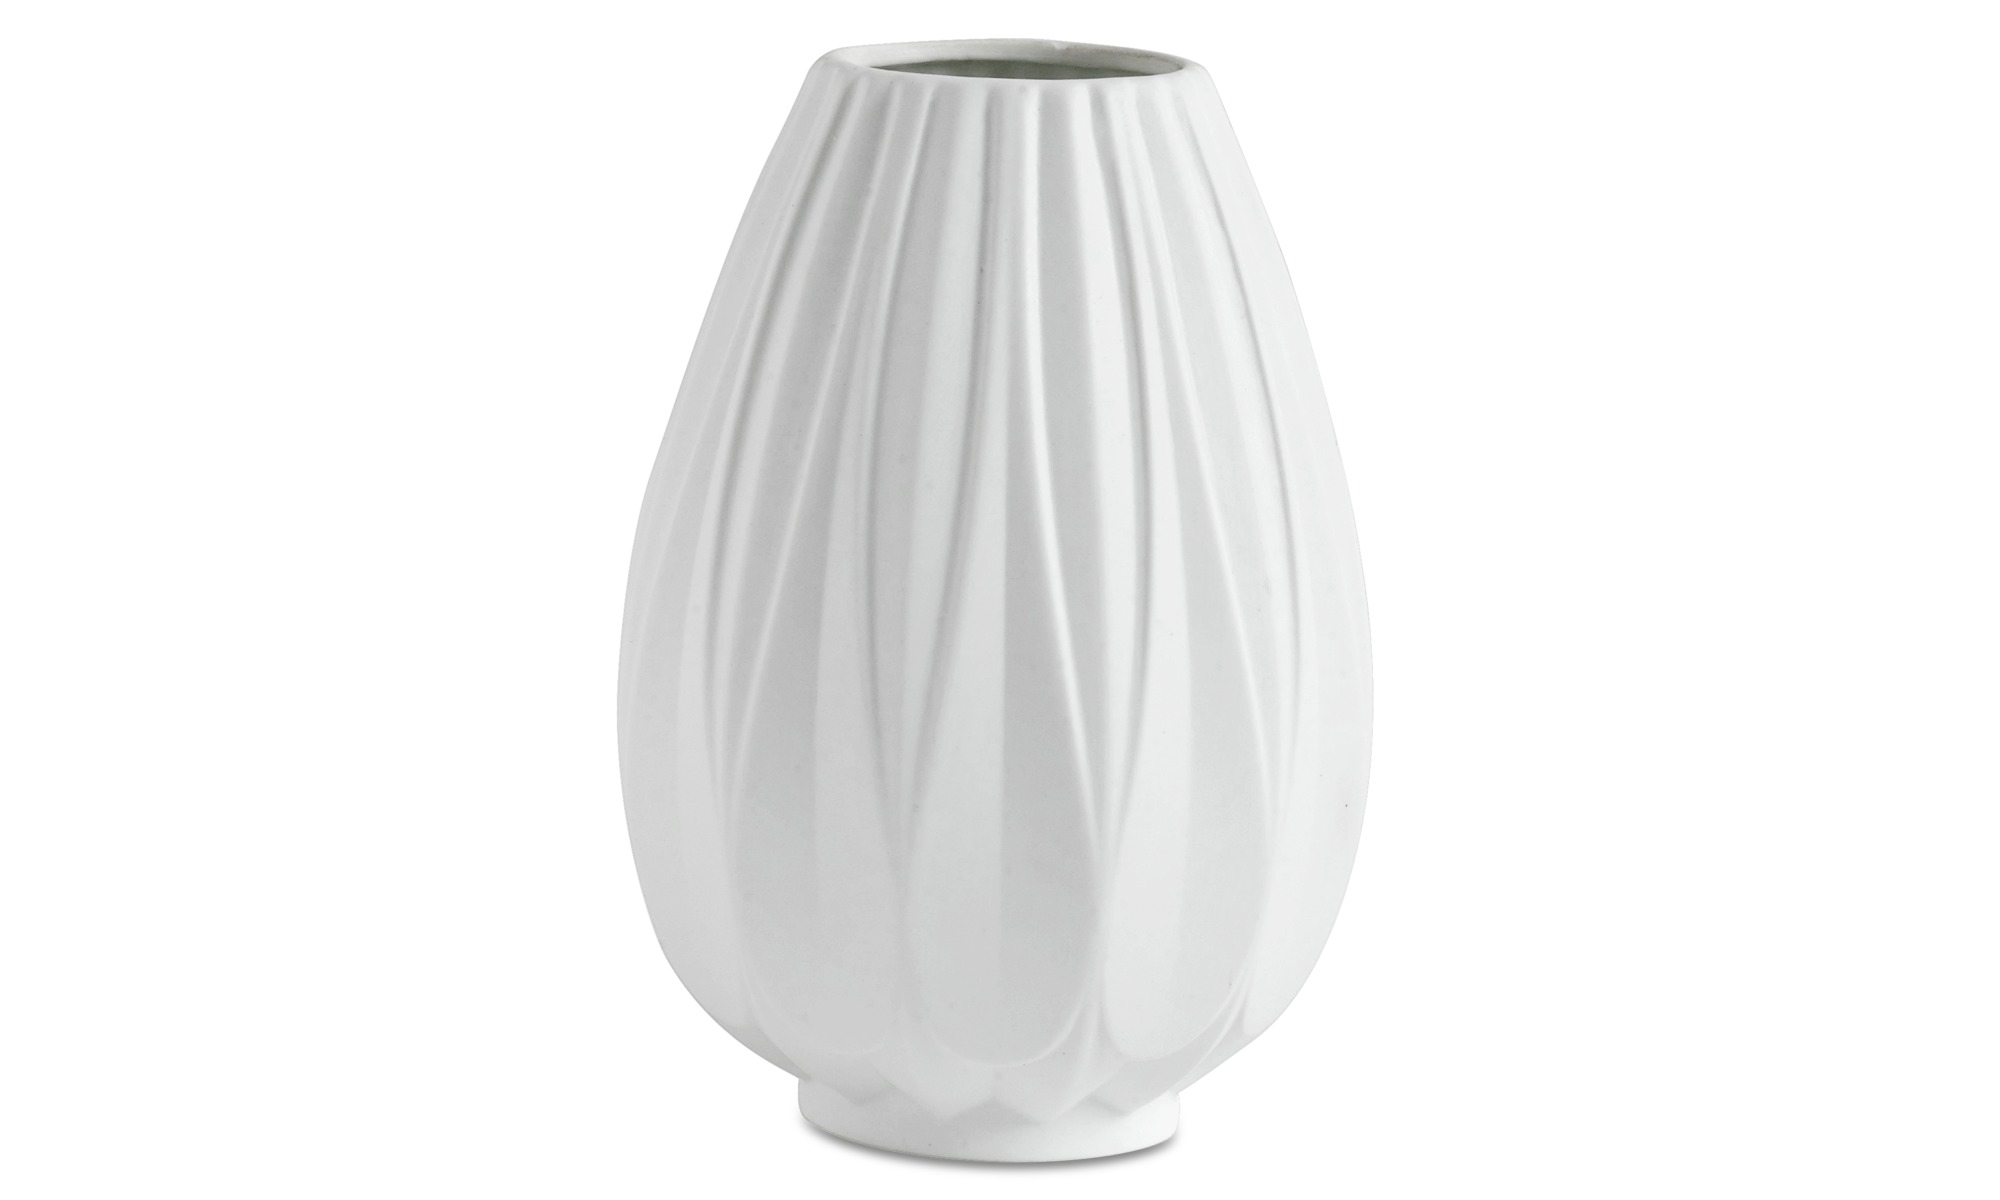 Vases relief vase boconcept vases relief vase white ceramic reviewsmspy